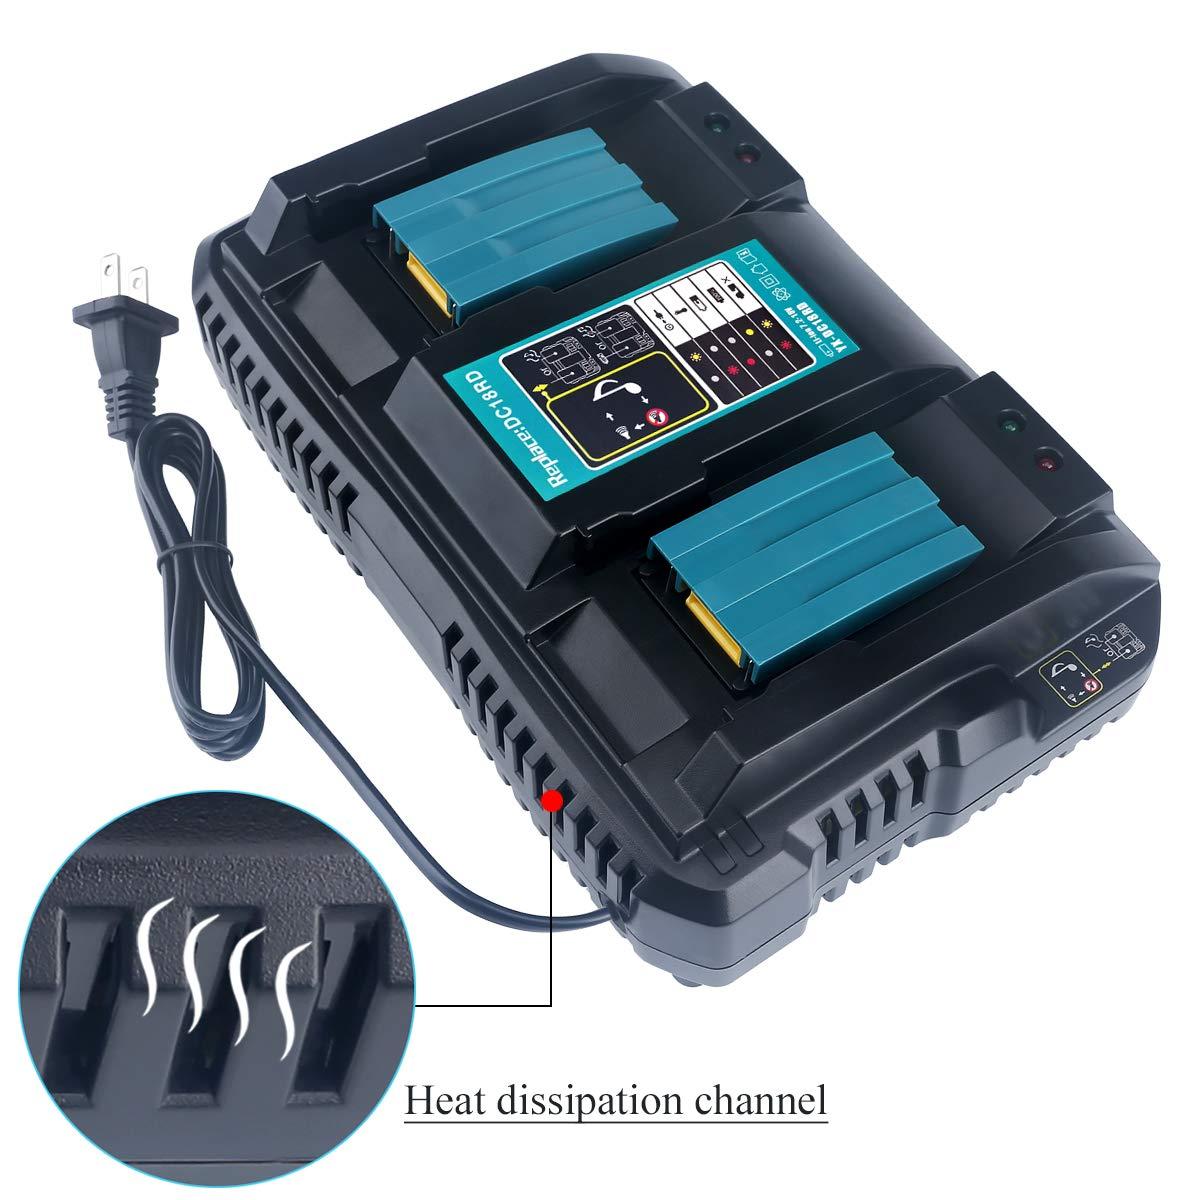 18 Volt Dual Port Charger for Makita 18V LXT Lithium-Ion Battery BL1815 BL1830 BL1840 DC1850 BL1860 LXT400 Cordless